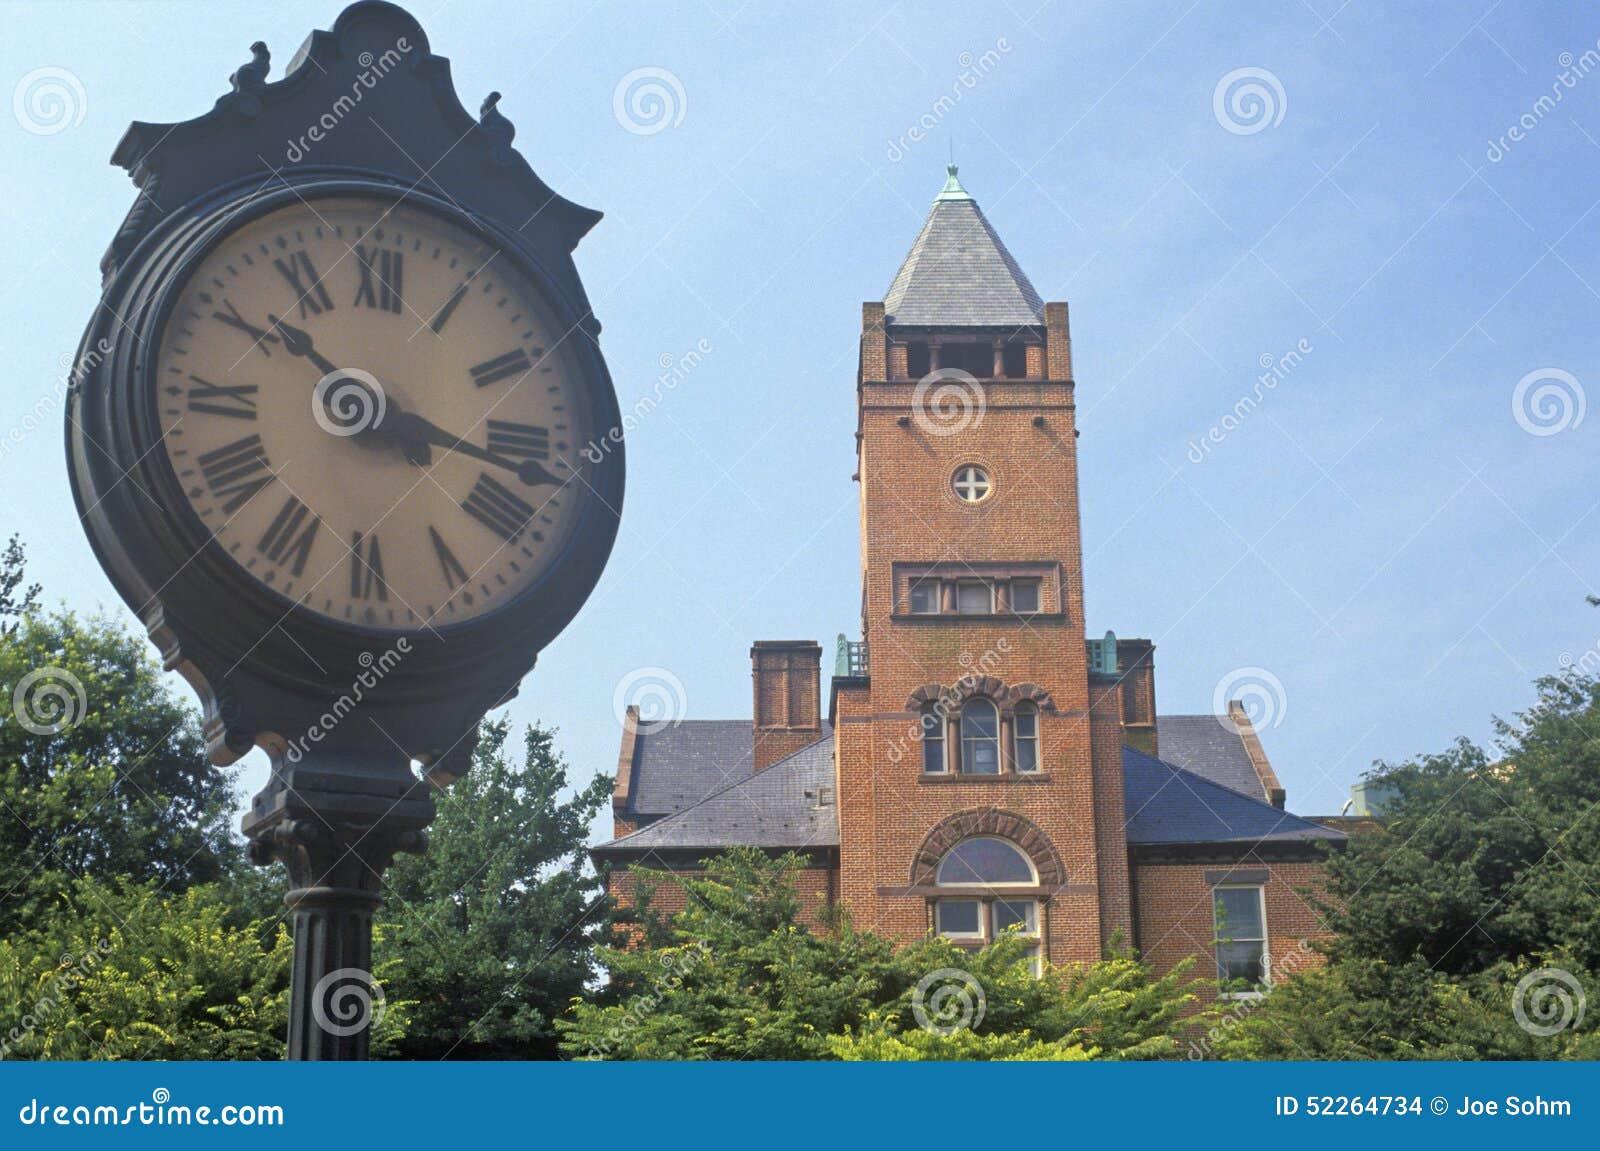 Tribunal del ladrillo rojo, Rockville, Maryland